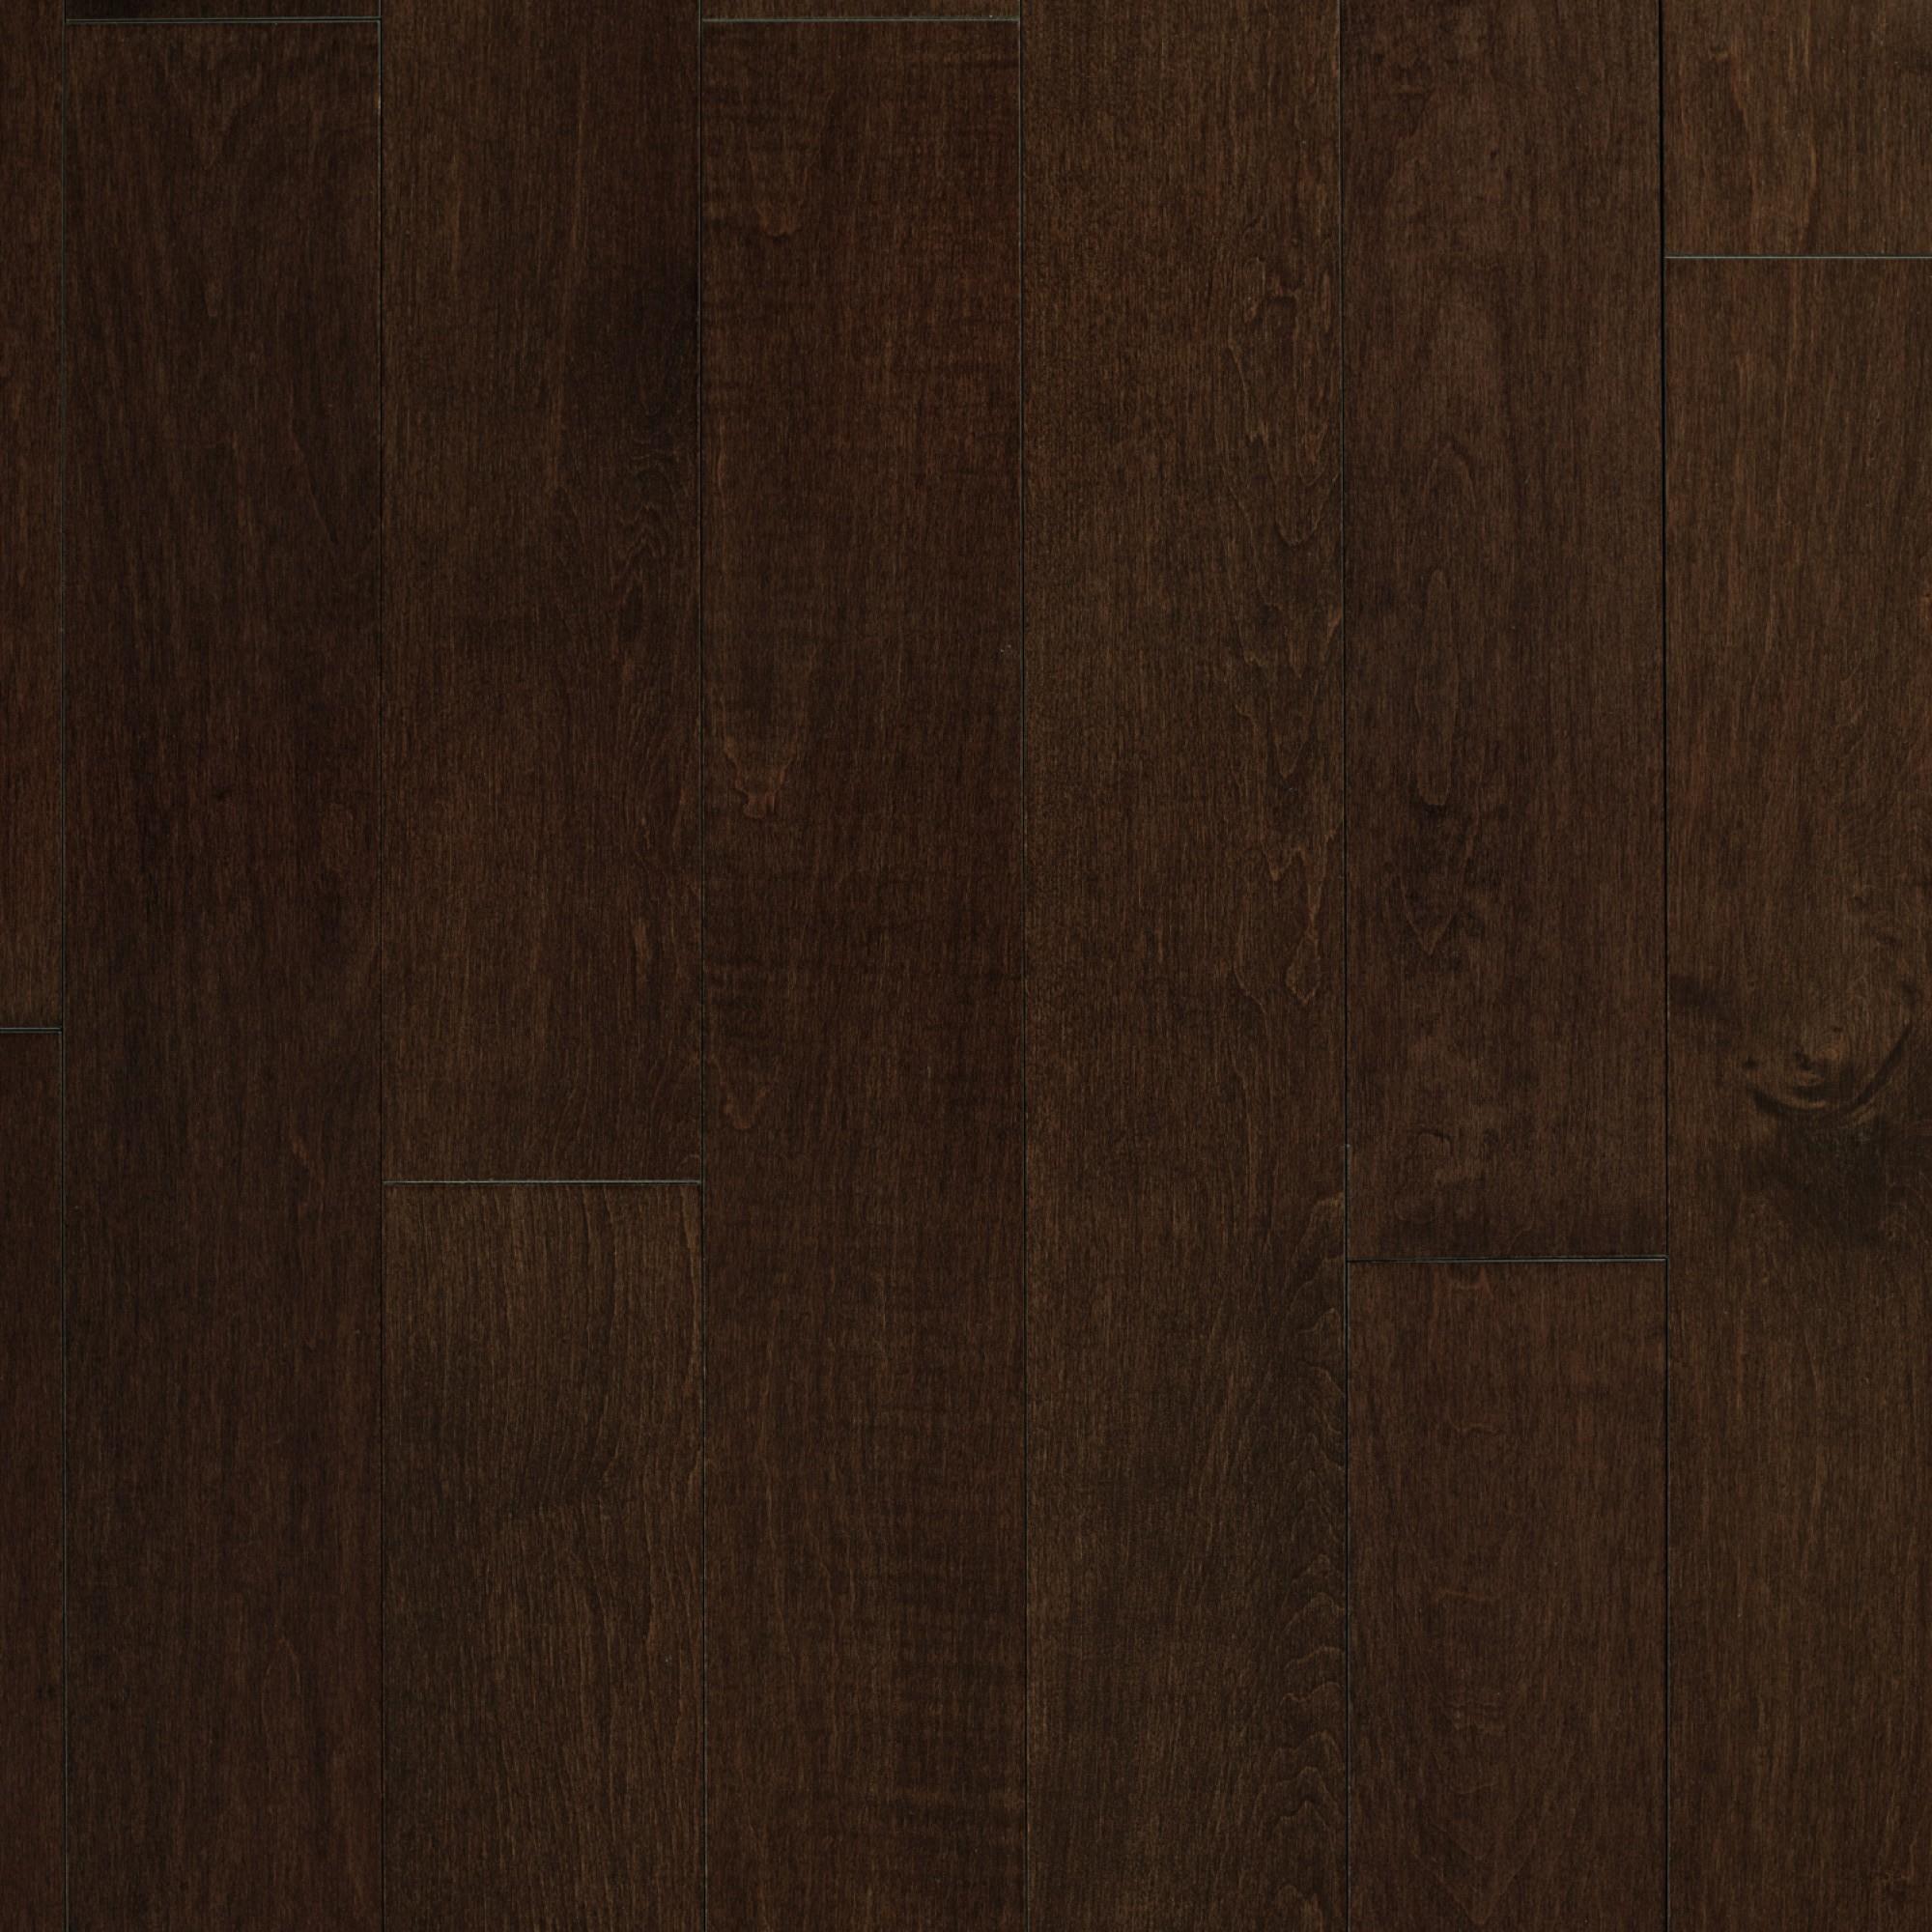 Maple Rembrandt